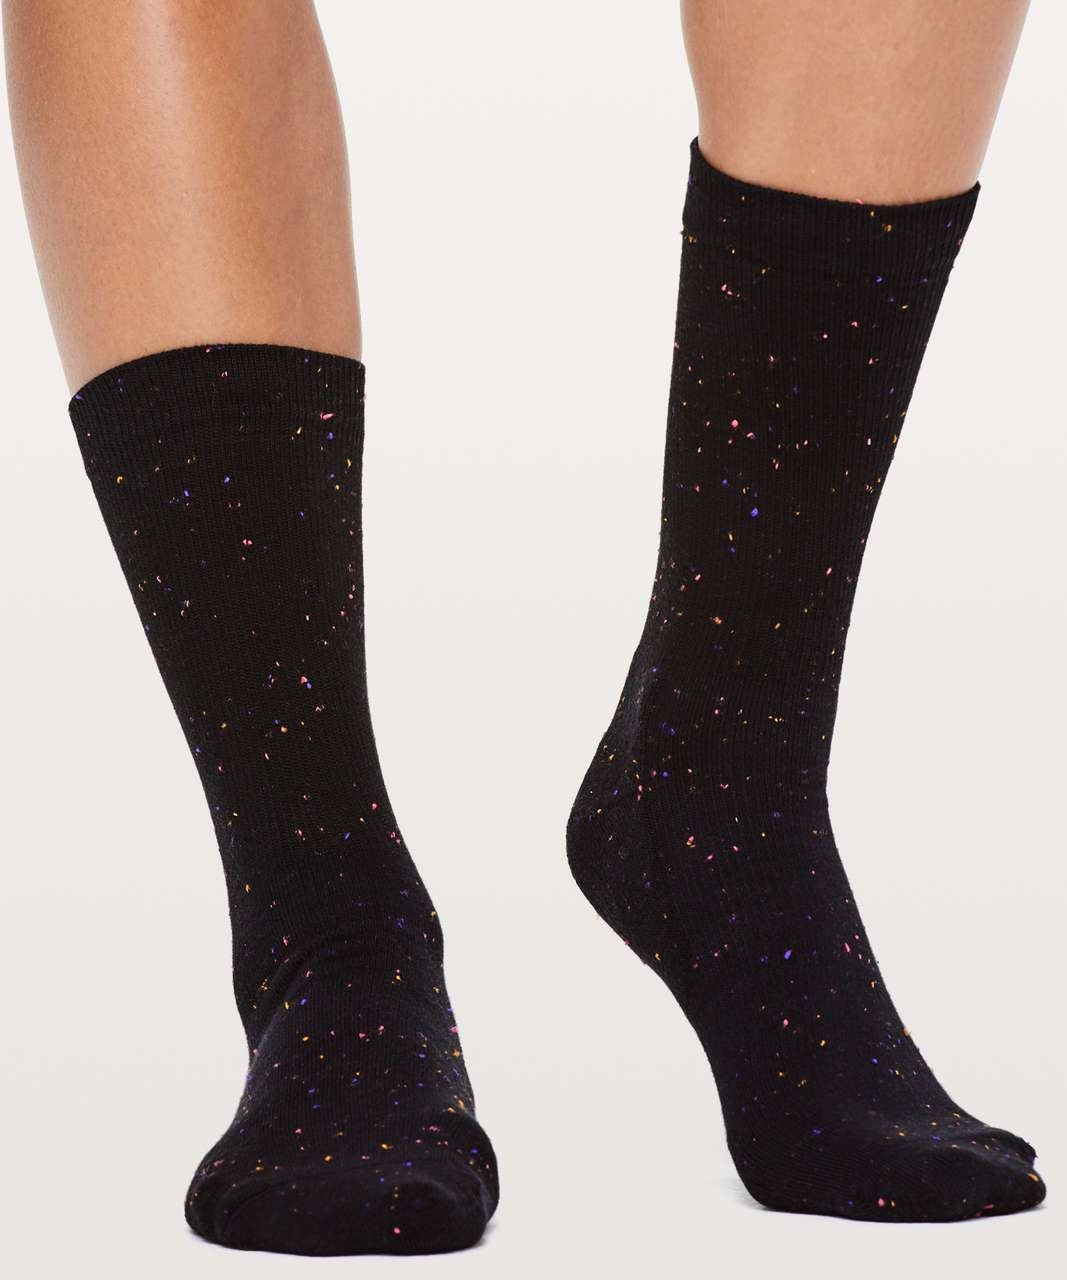 Lululemon Cozy Kick Crew Sock - Black